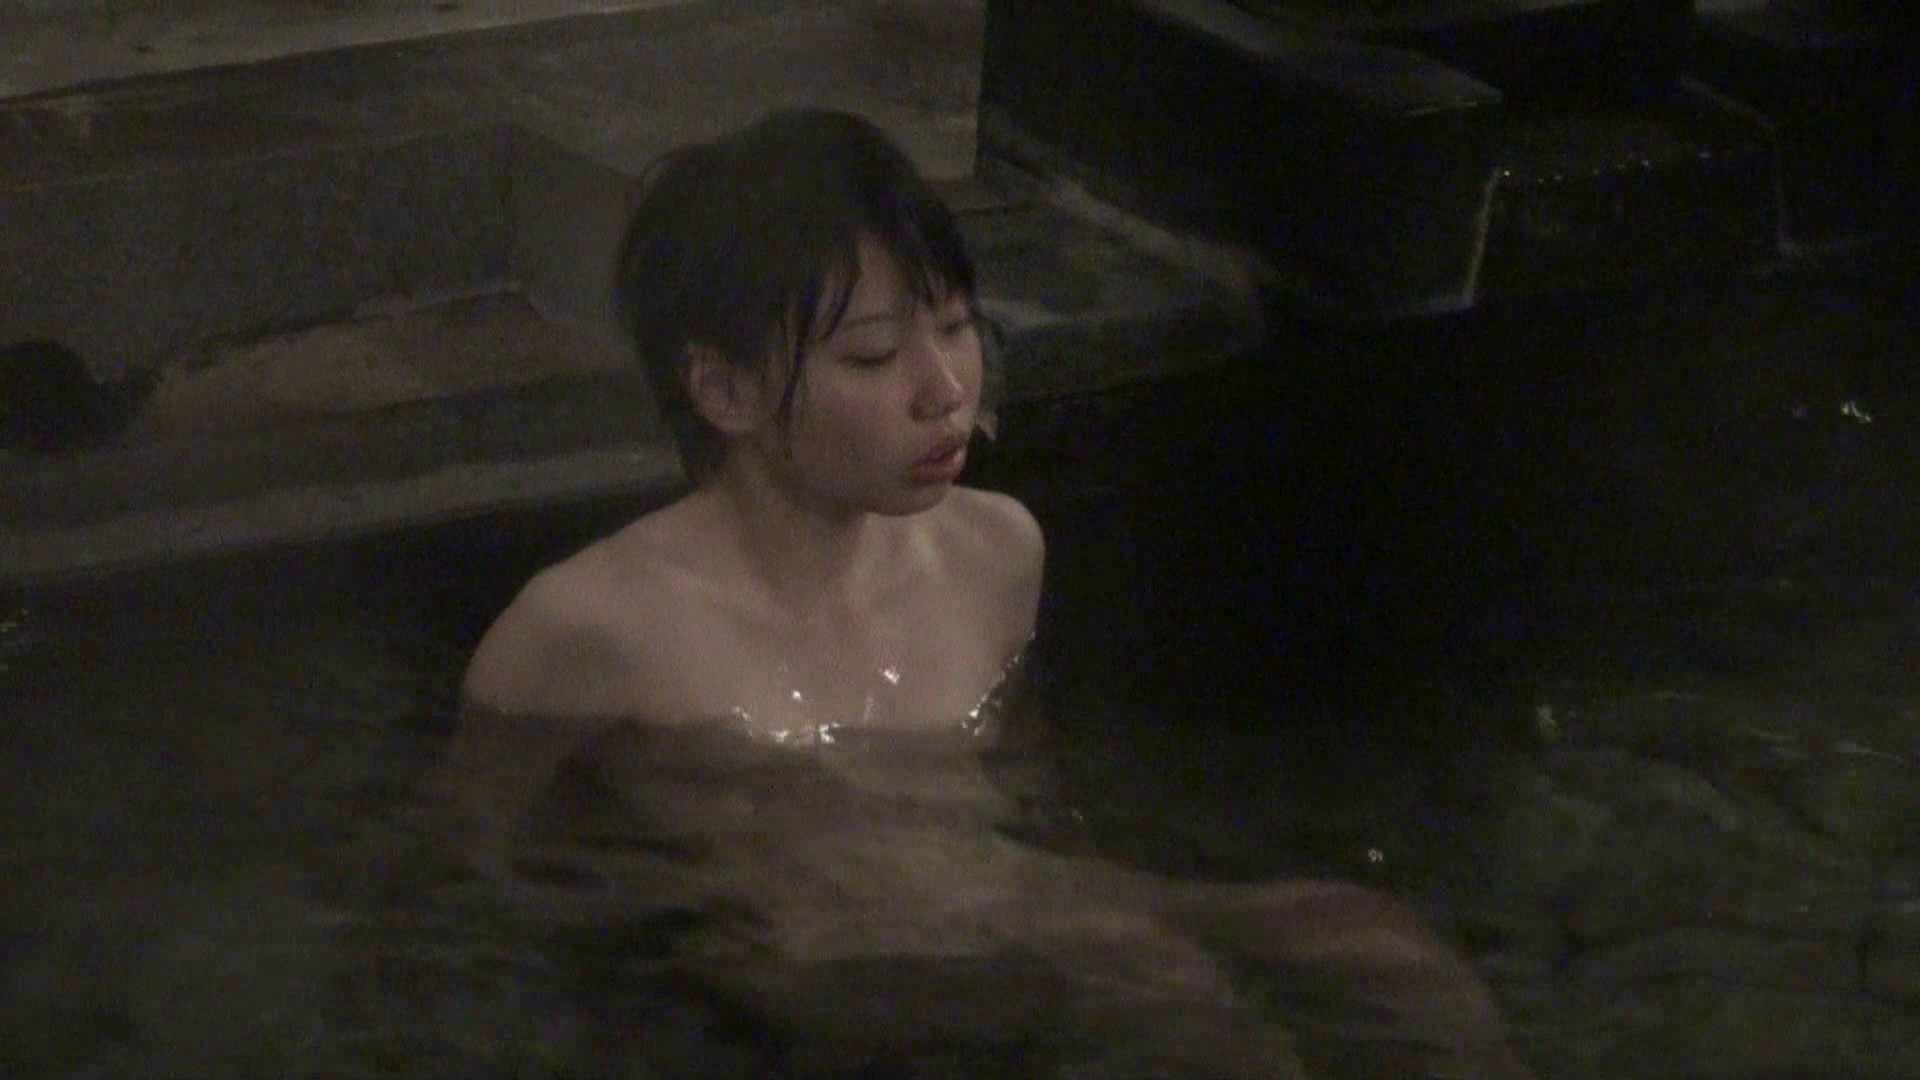 Aquaな露天風呂Vol.323 露天 AV無料動画キャプチャ 69連発 19